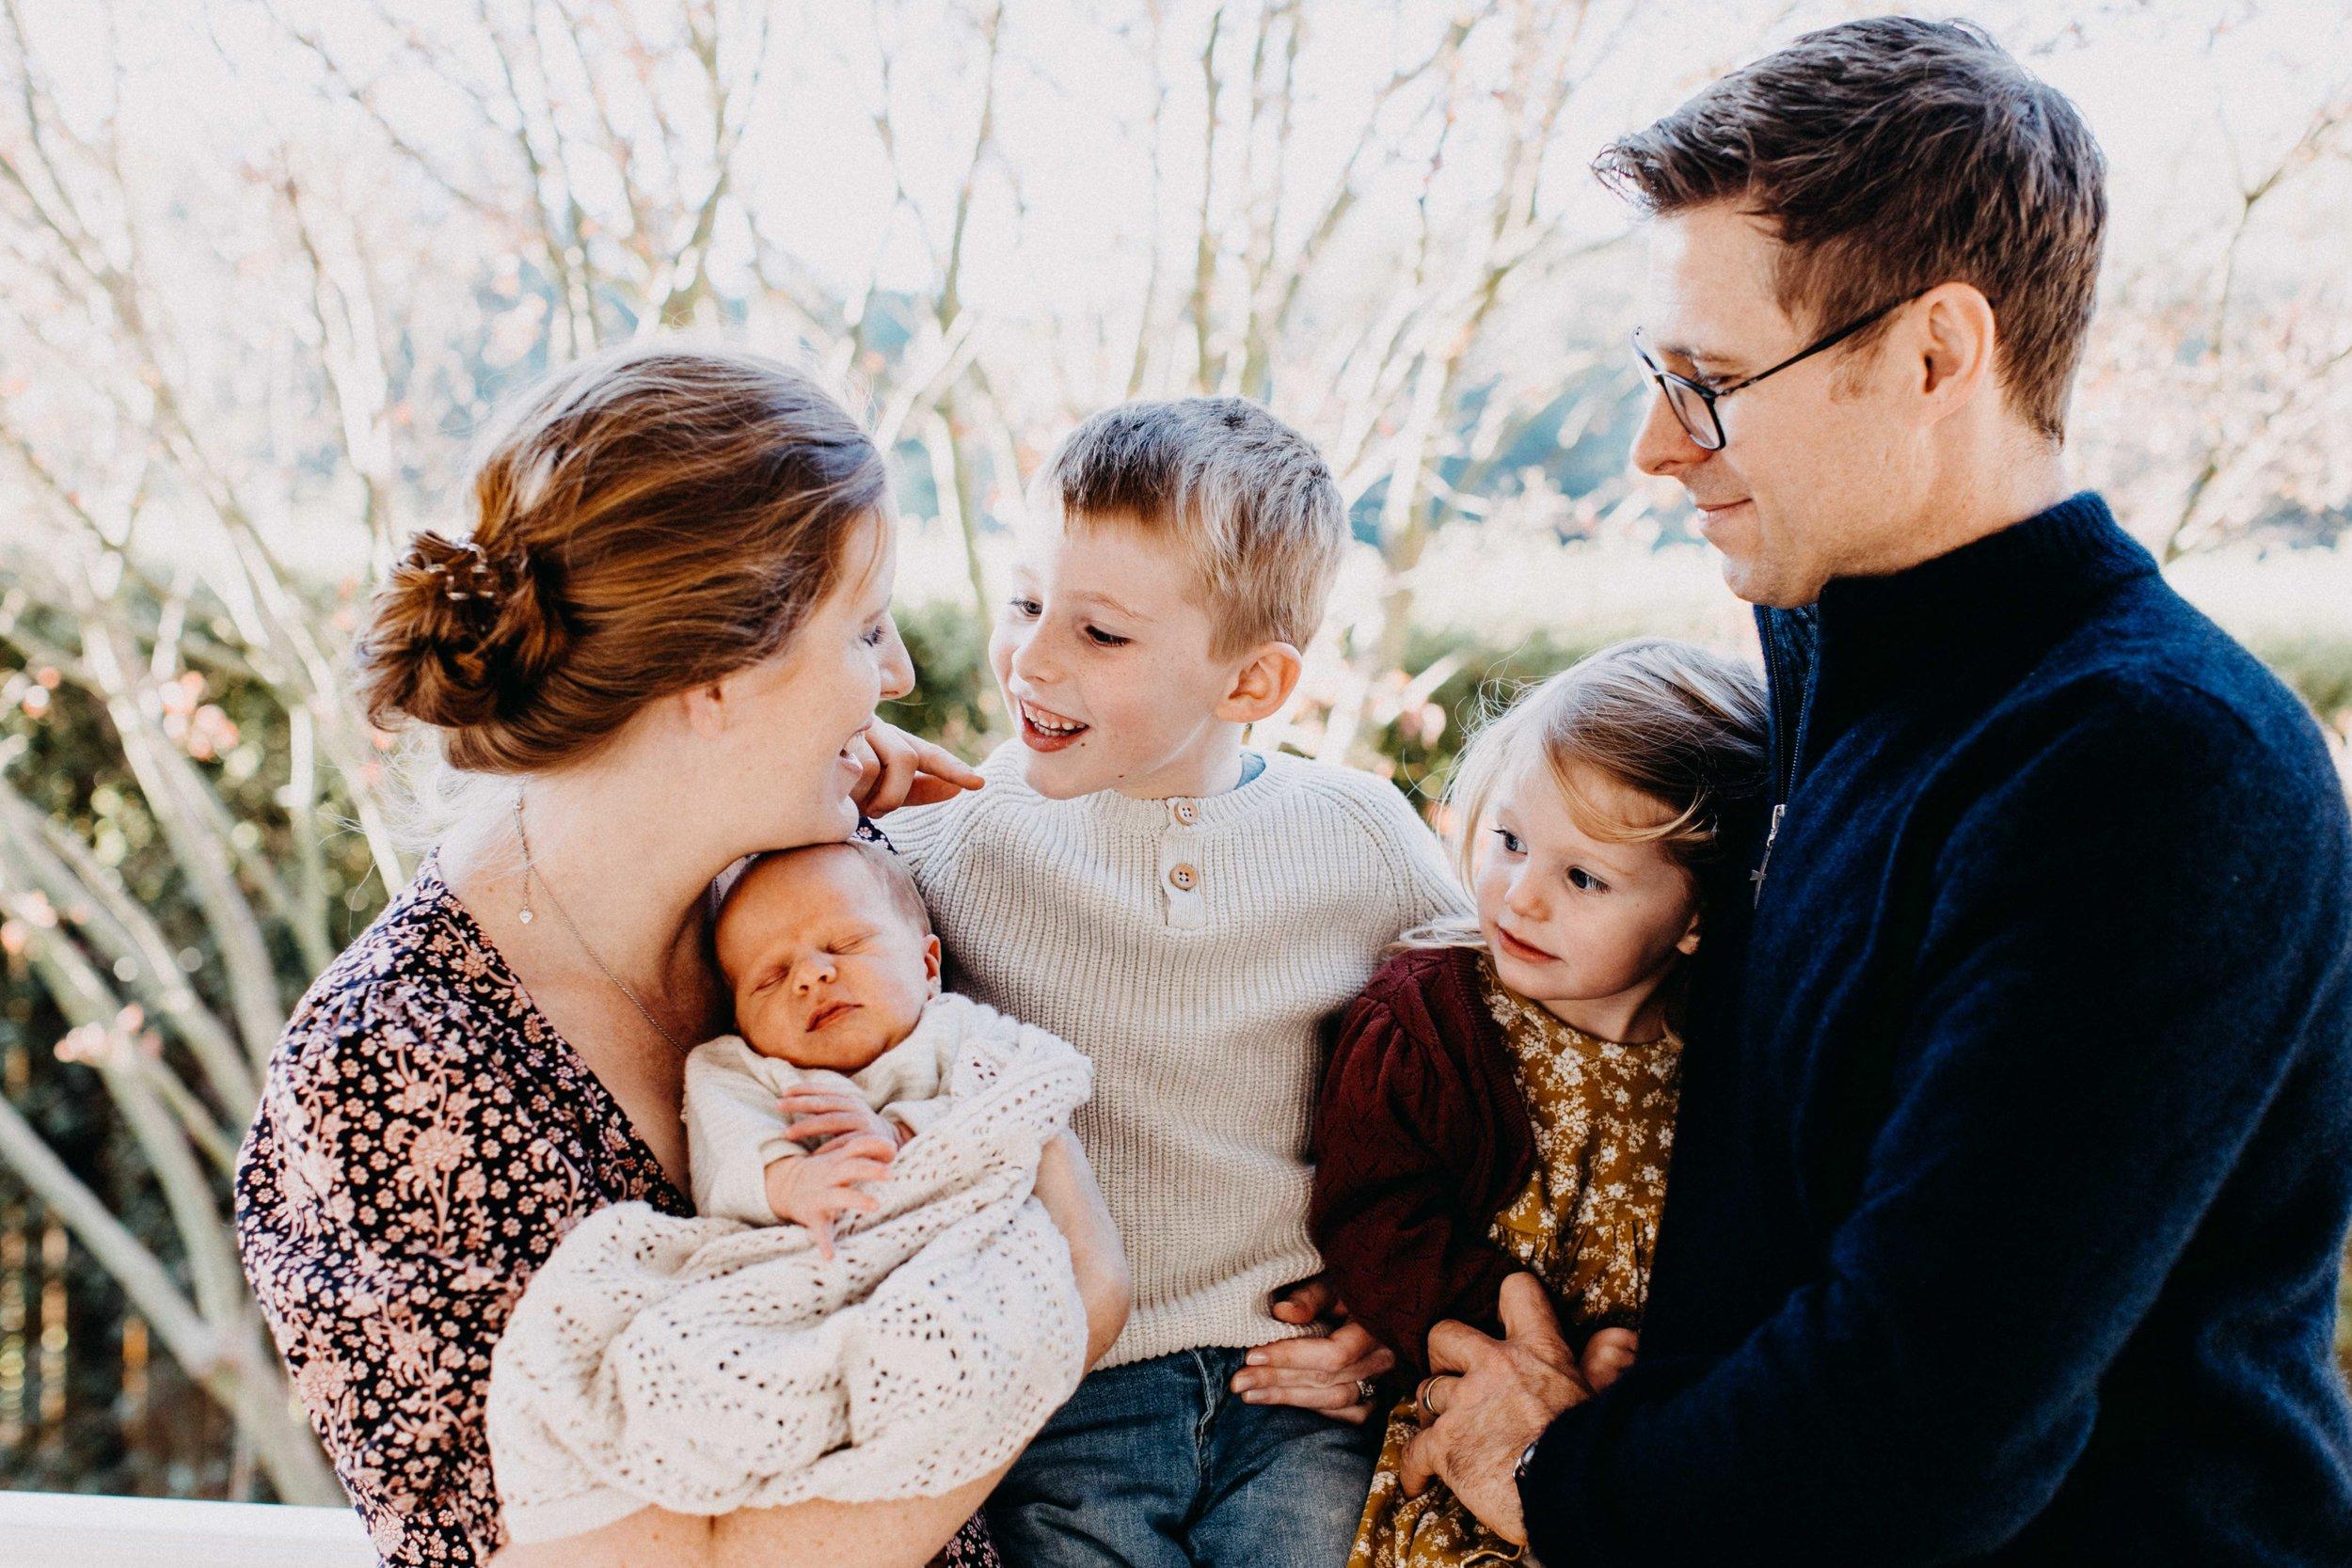 bowral-newborn-photographer-family-herrmann-southern-highlands-41.jpg